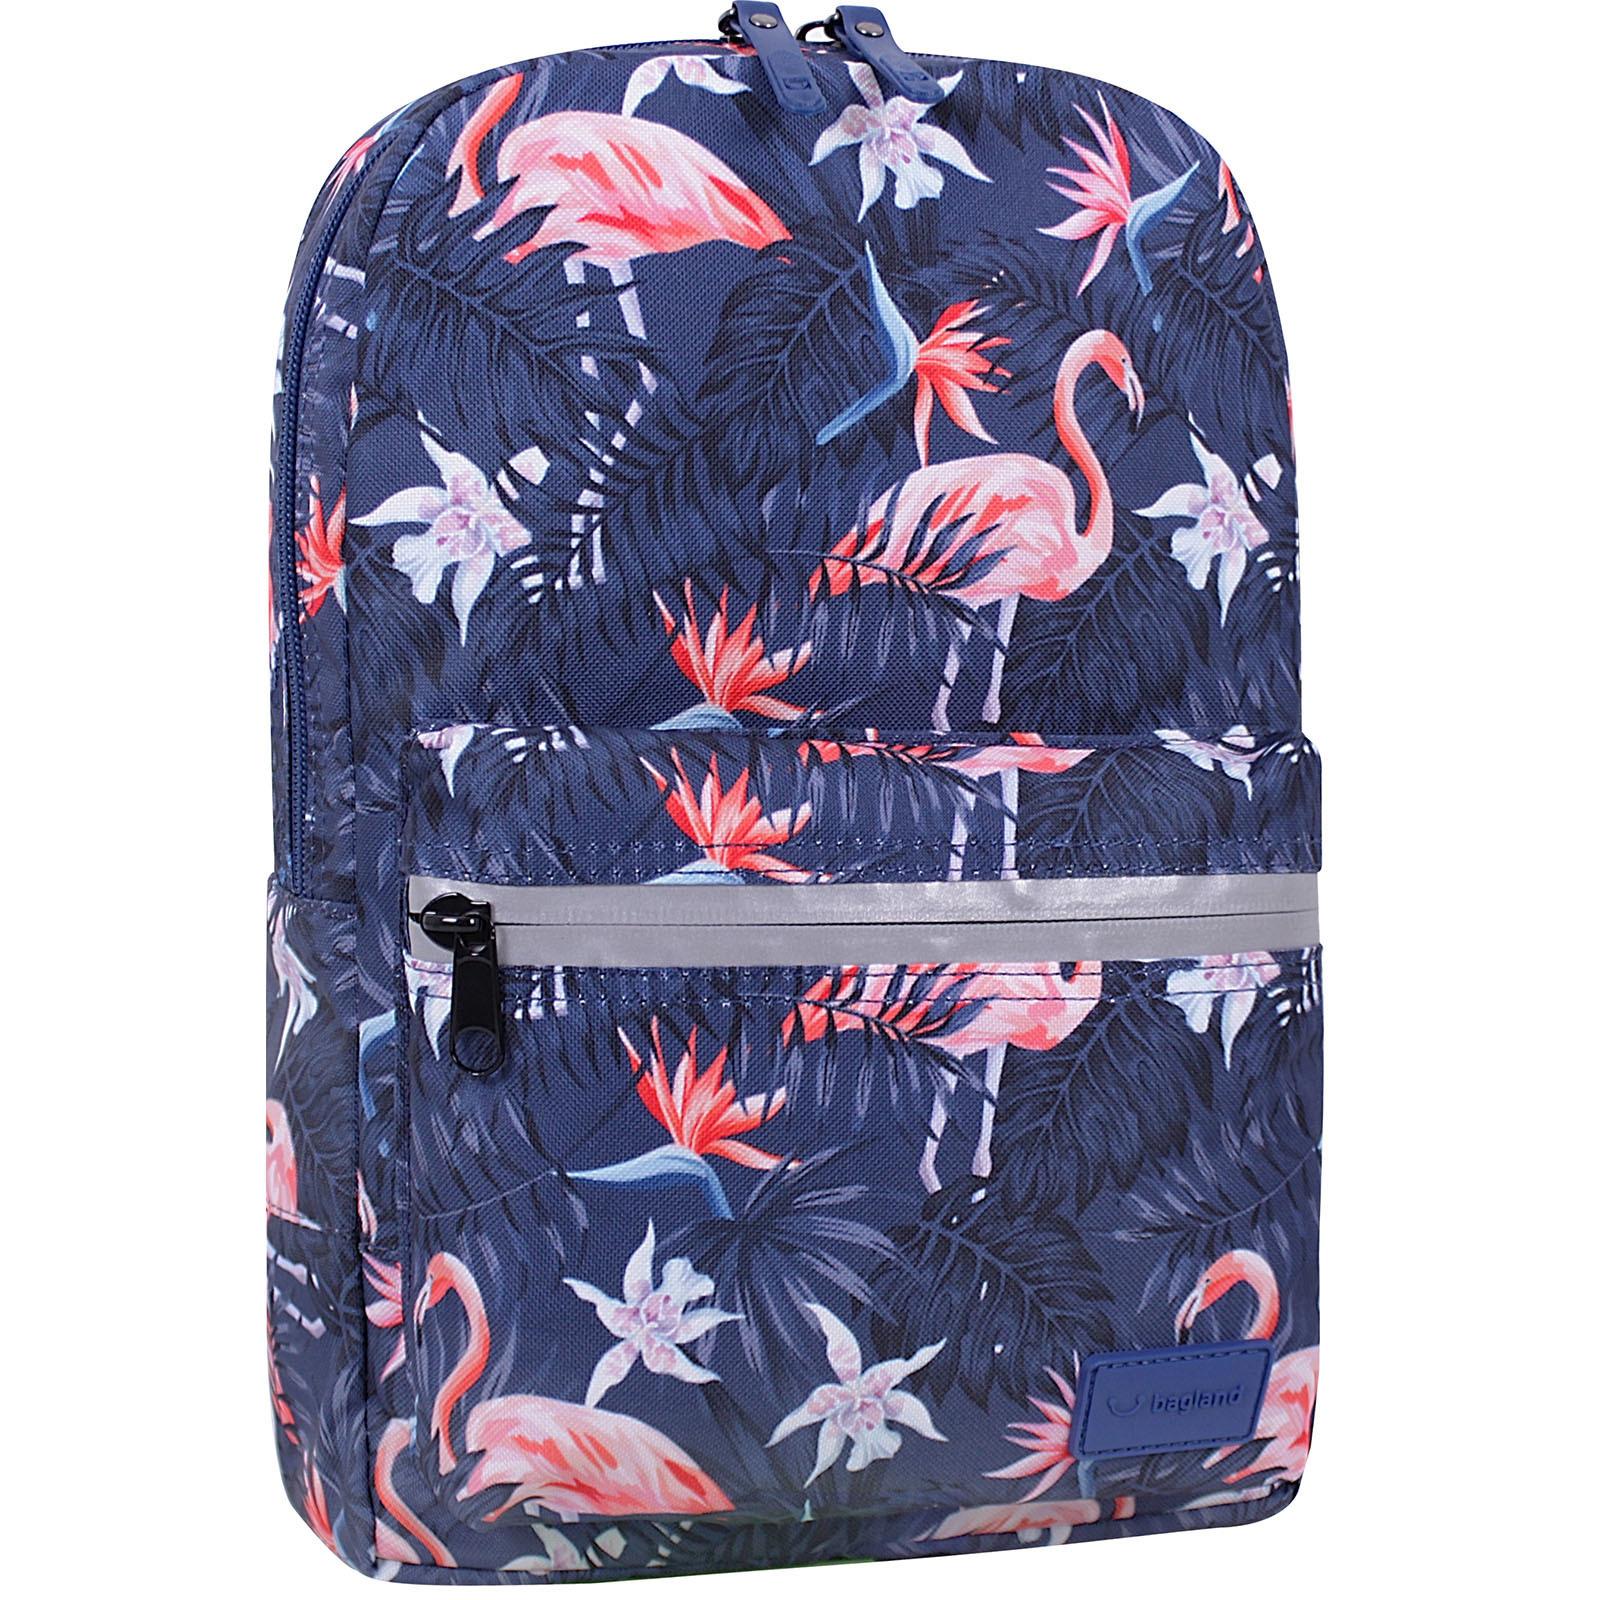 Молодежные рюкзаки Рюкзак Bagland Молодежный mini 8 л. сублимация 762 (00508664) IMG_1270суб.762.JPG